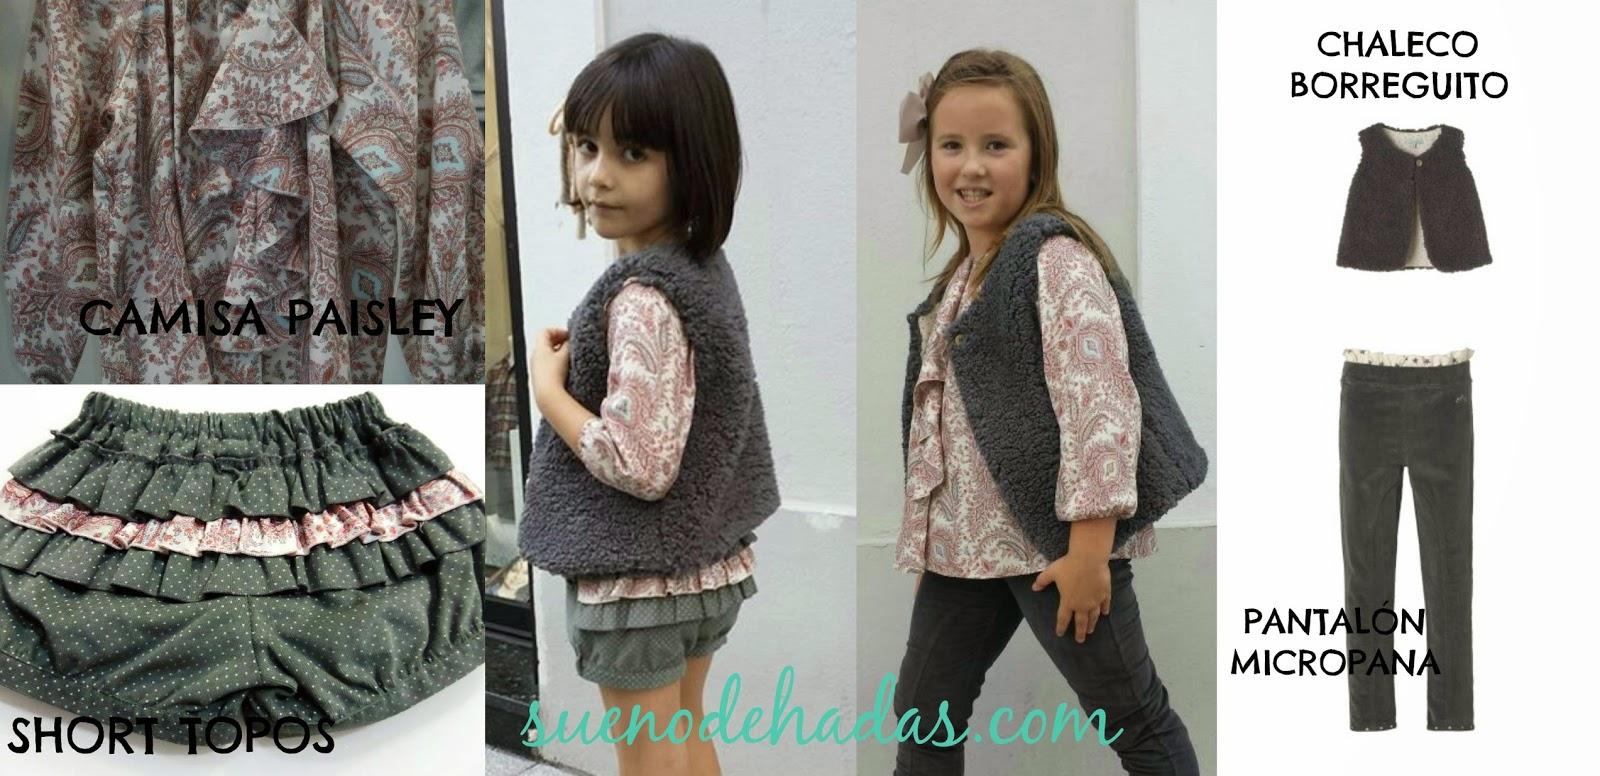 Nanos moda infantil para niñas